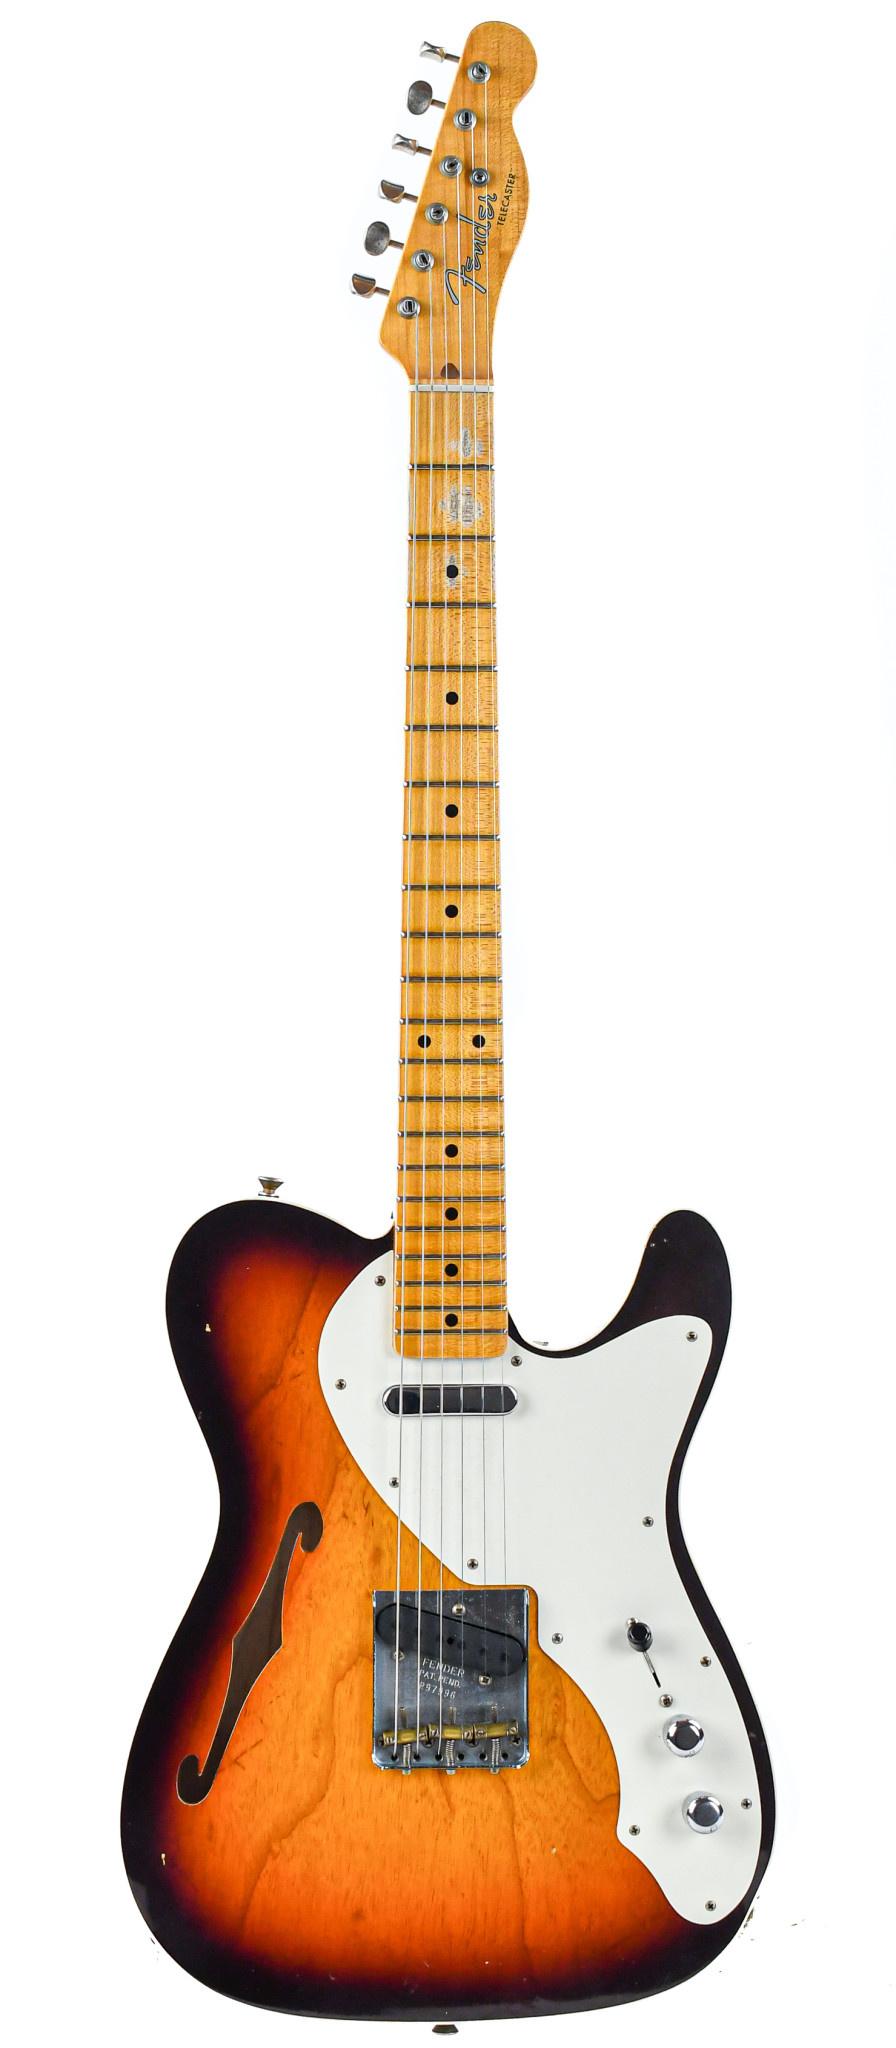 Fender 50s Thinline Telecaster Journeyman Relic 3 Tone Sunburst 2019